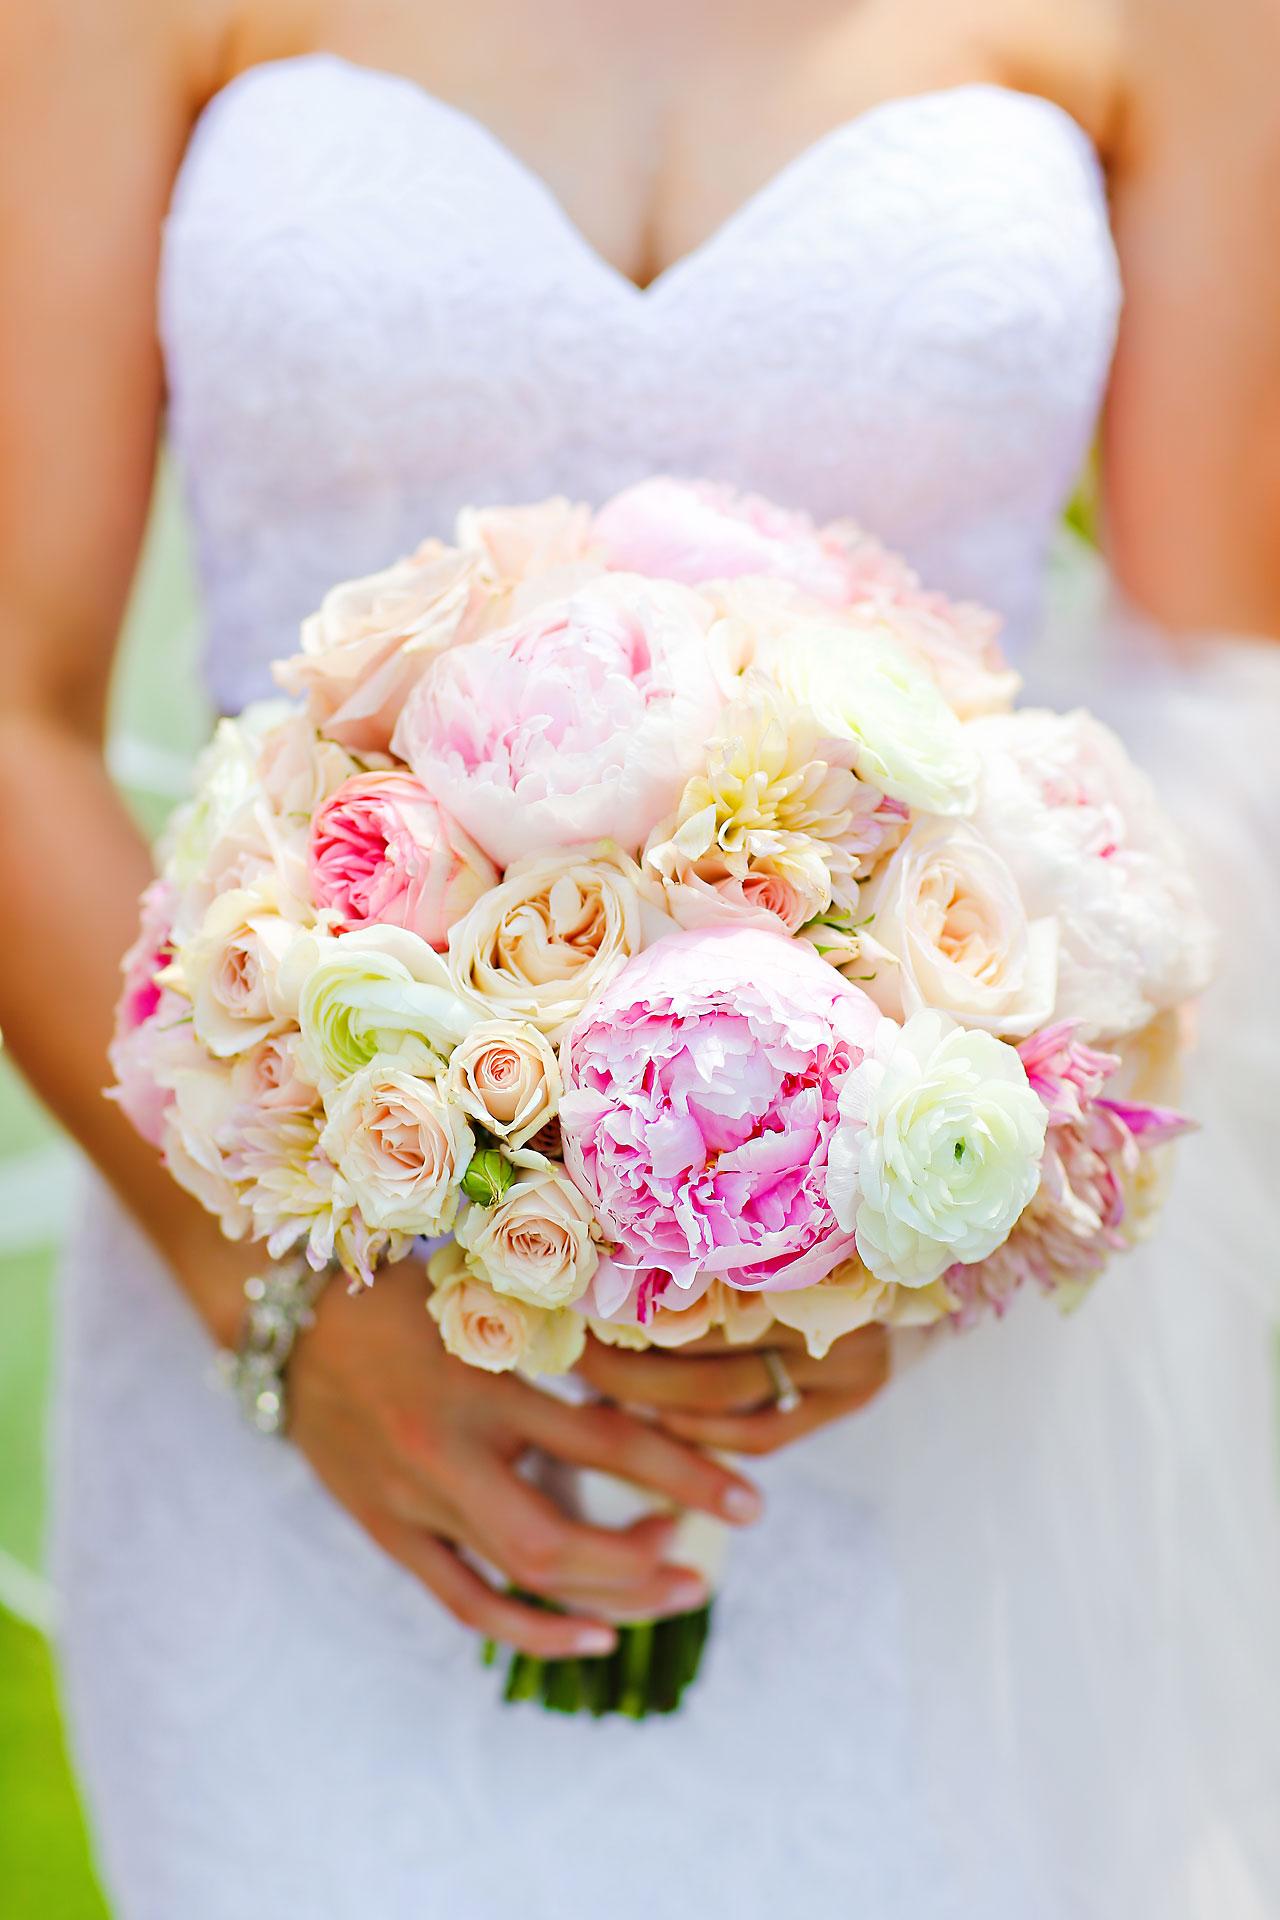 Emmy Benji Emyprean Fort Wayne Wedding 061